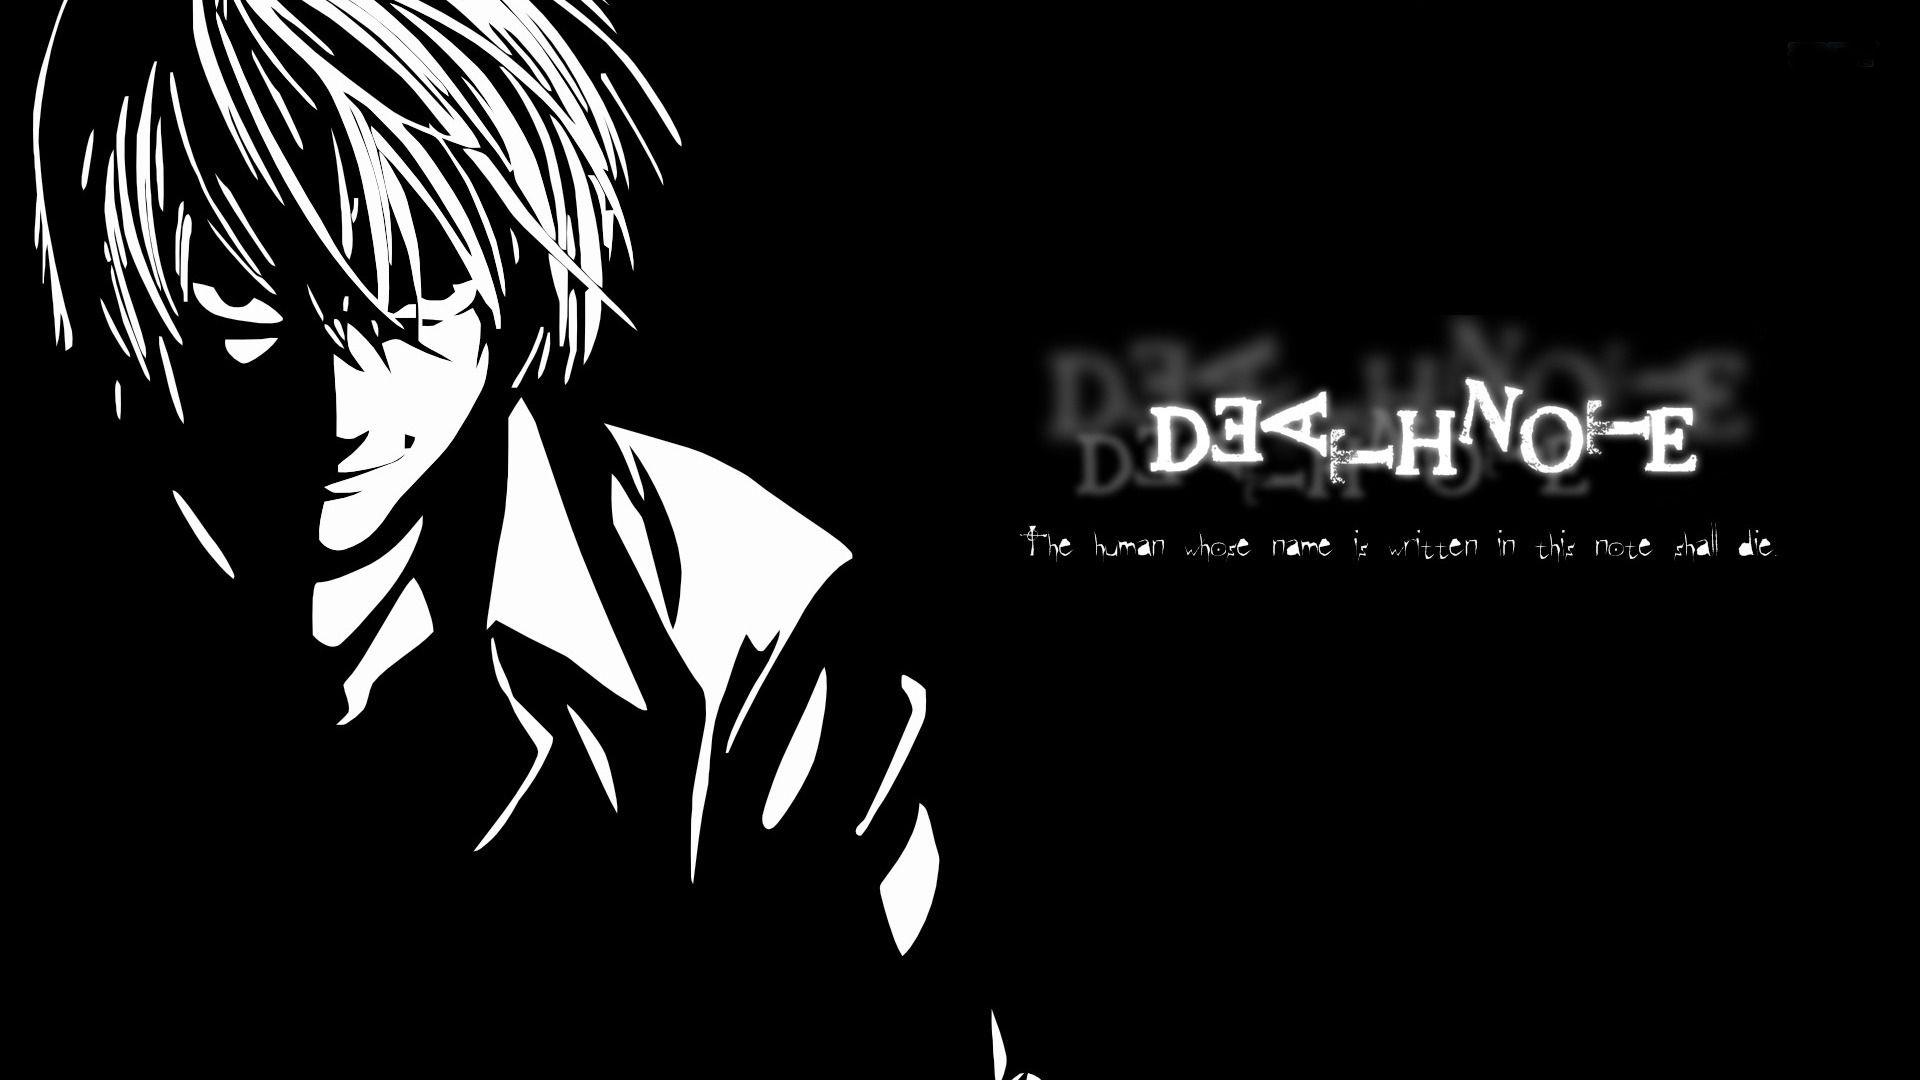 Death Note wallpaper 8